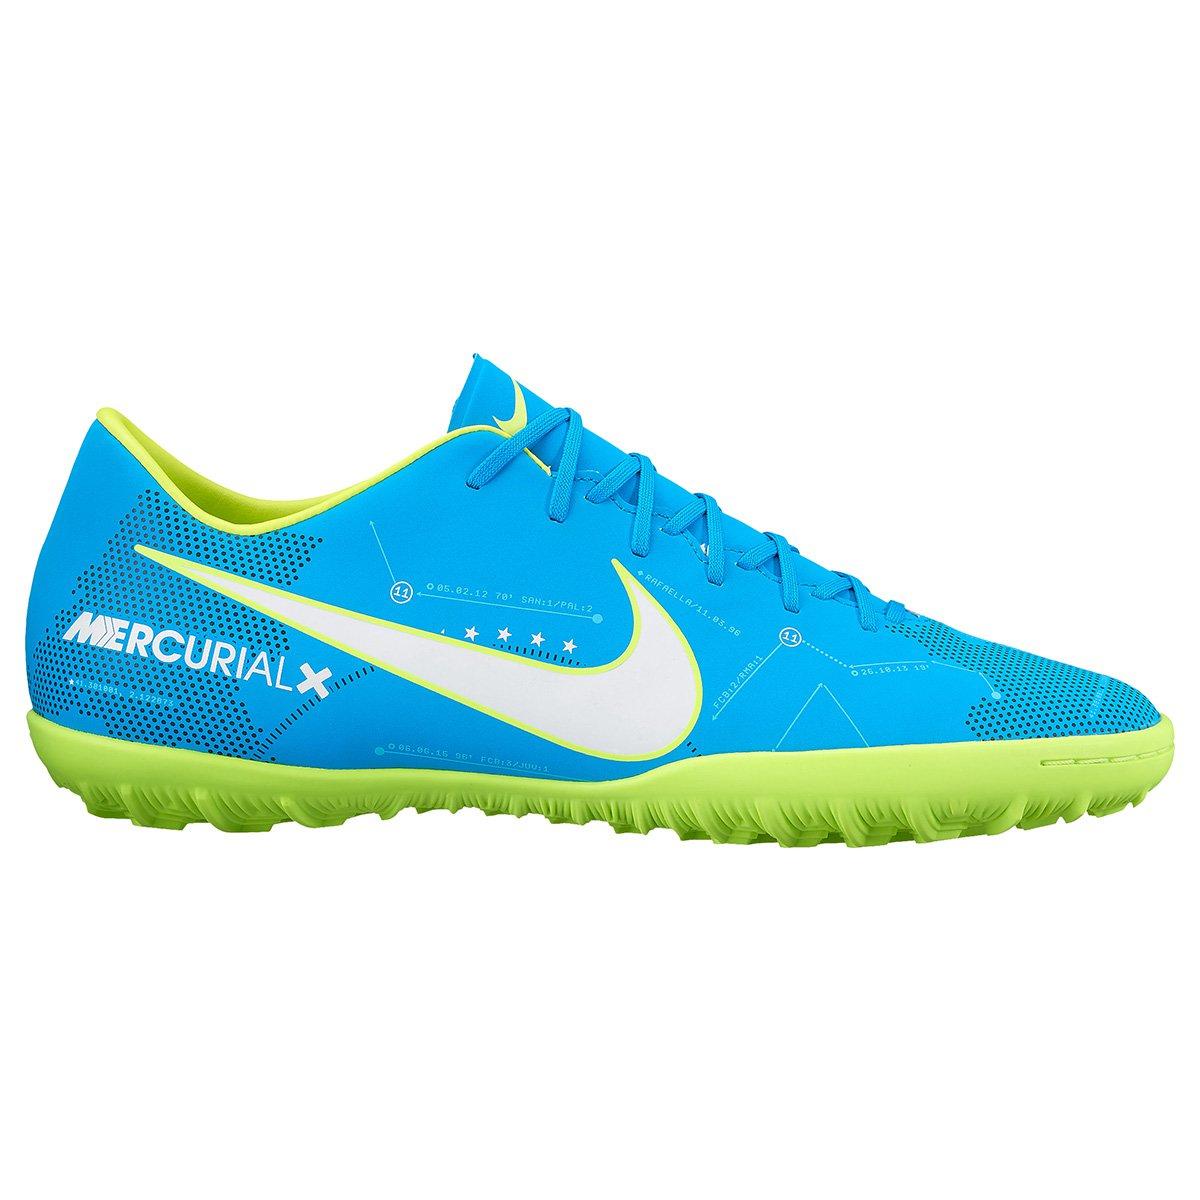 Chuteira Society Nike Mercurial Victory 6 Neymar Jr TF - Compre ... 0b0cbdc82e74b